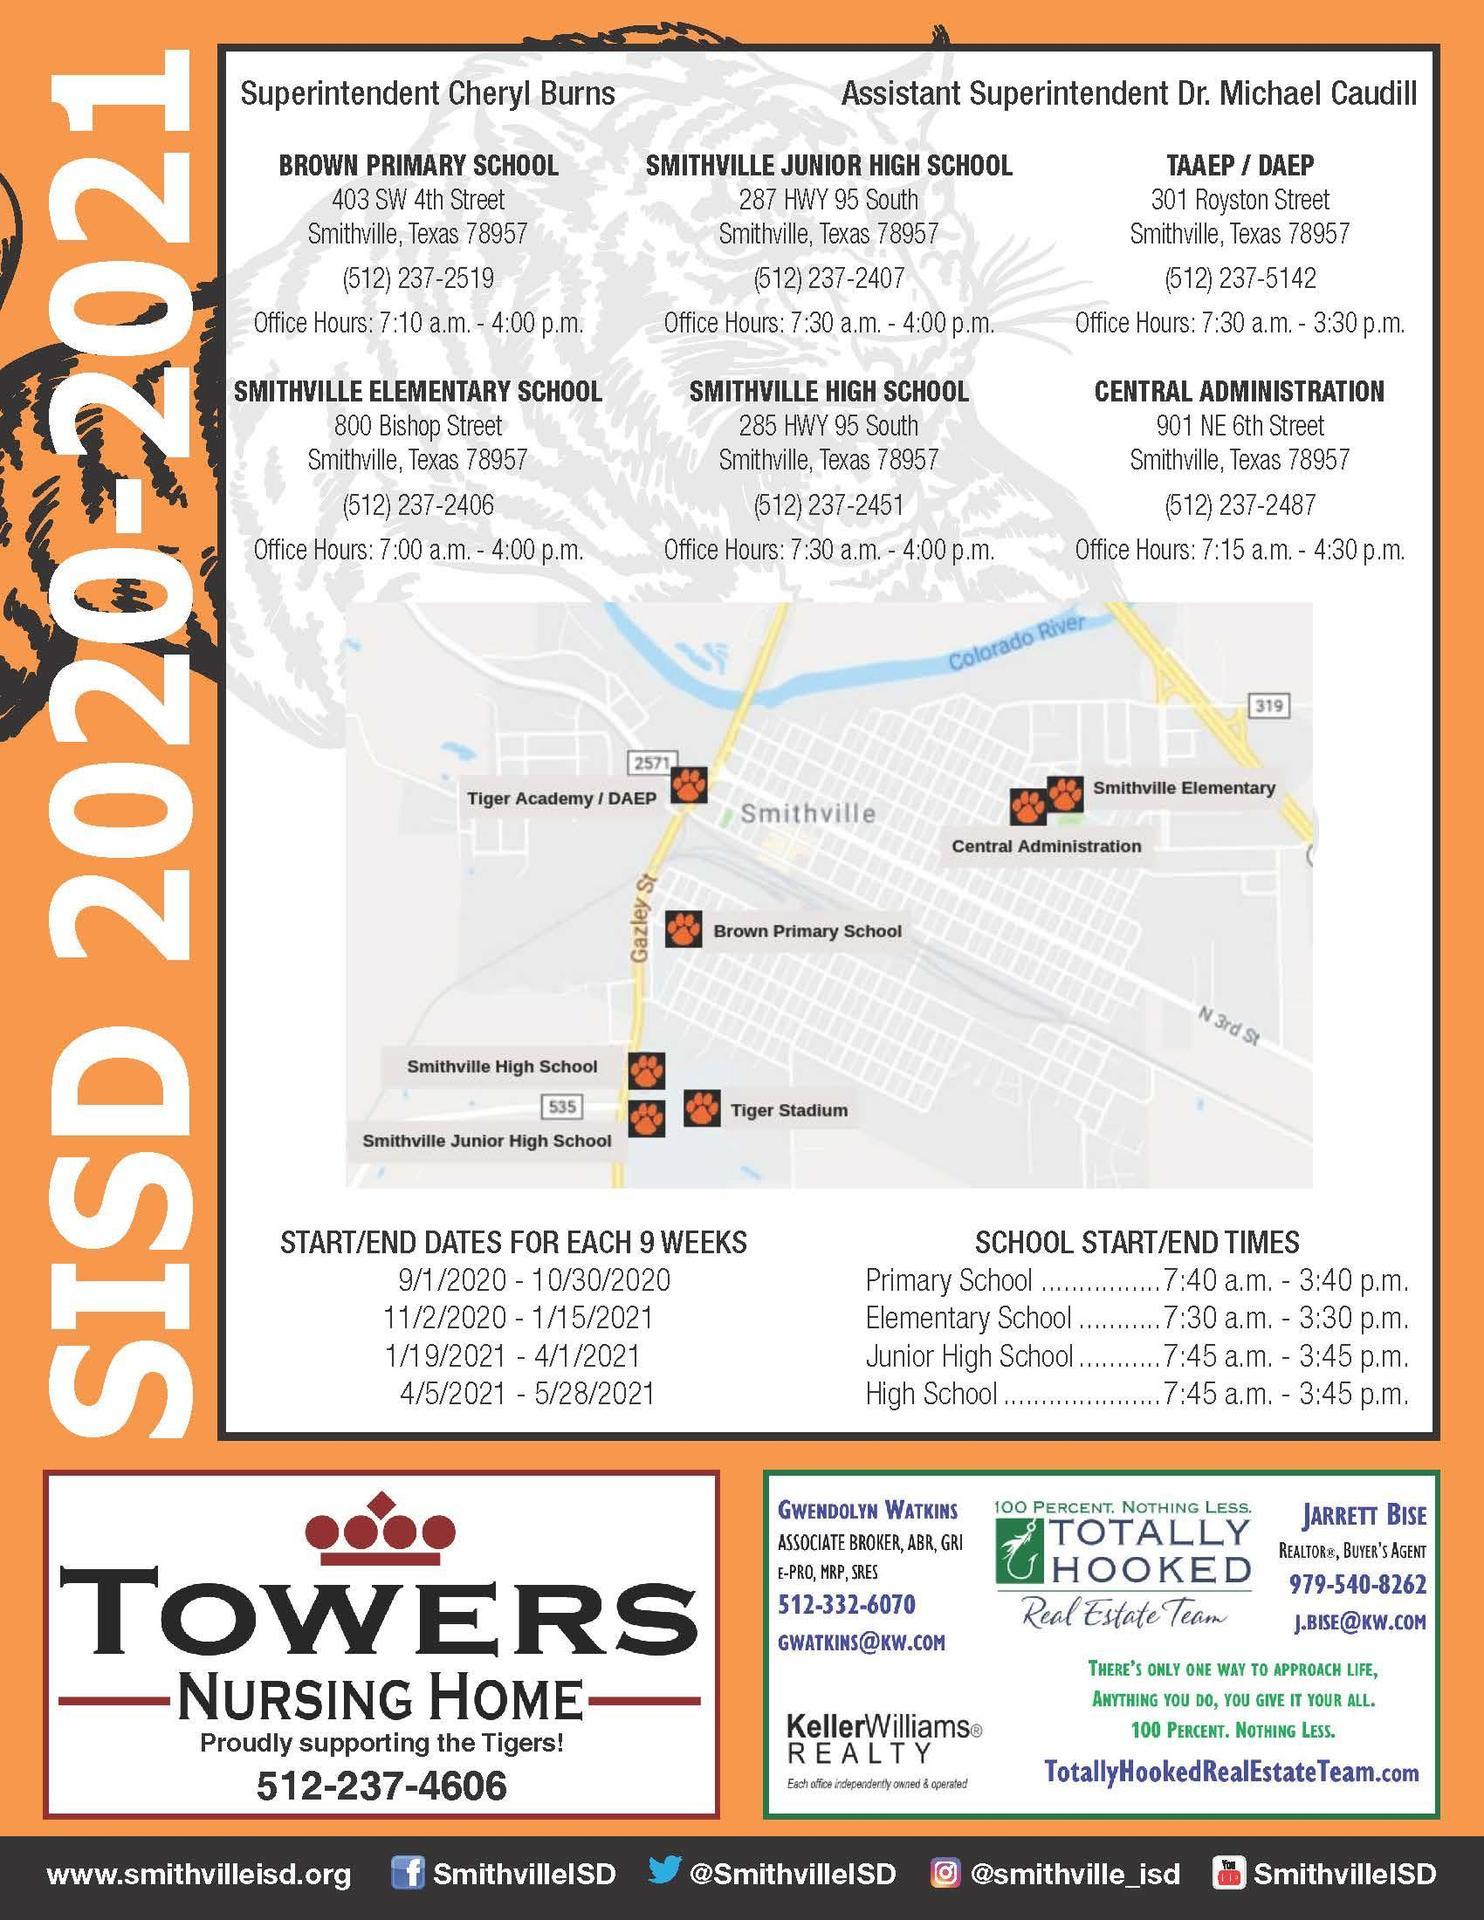 2020 SISD Academic Calendar page 2